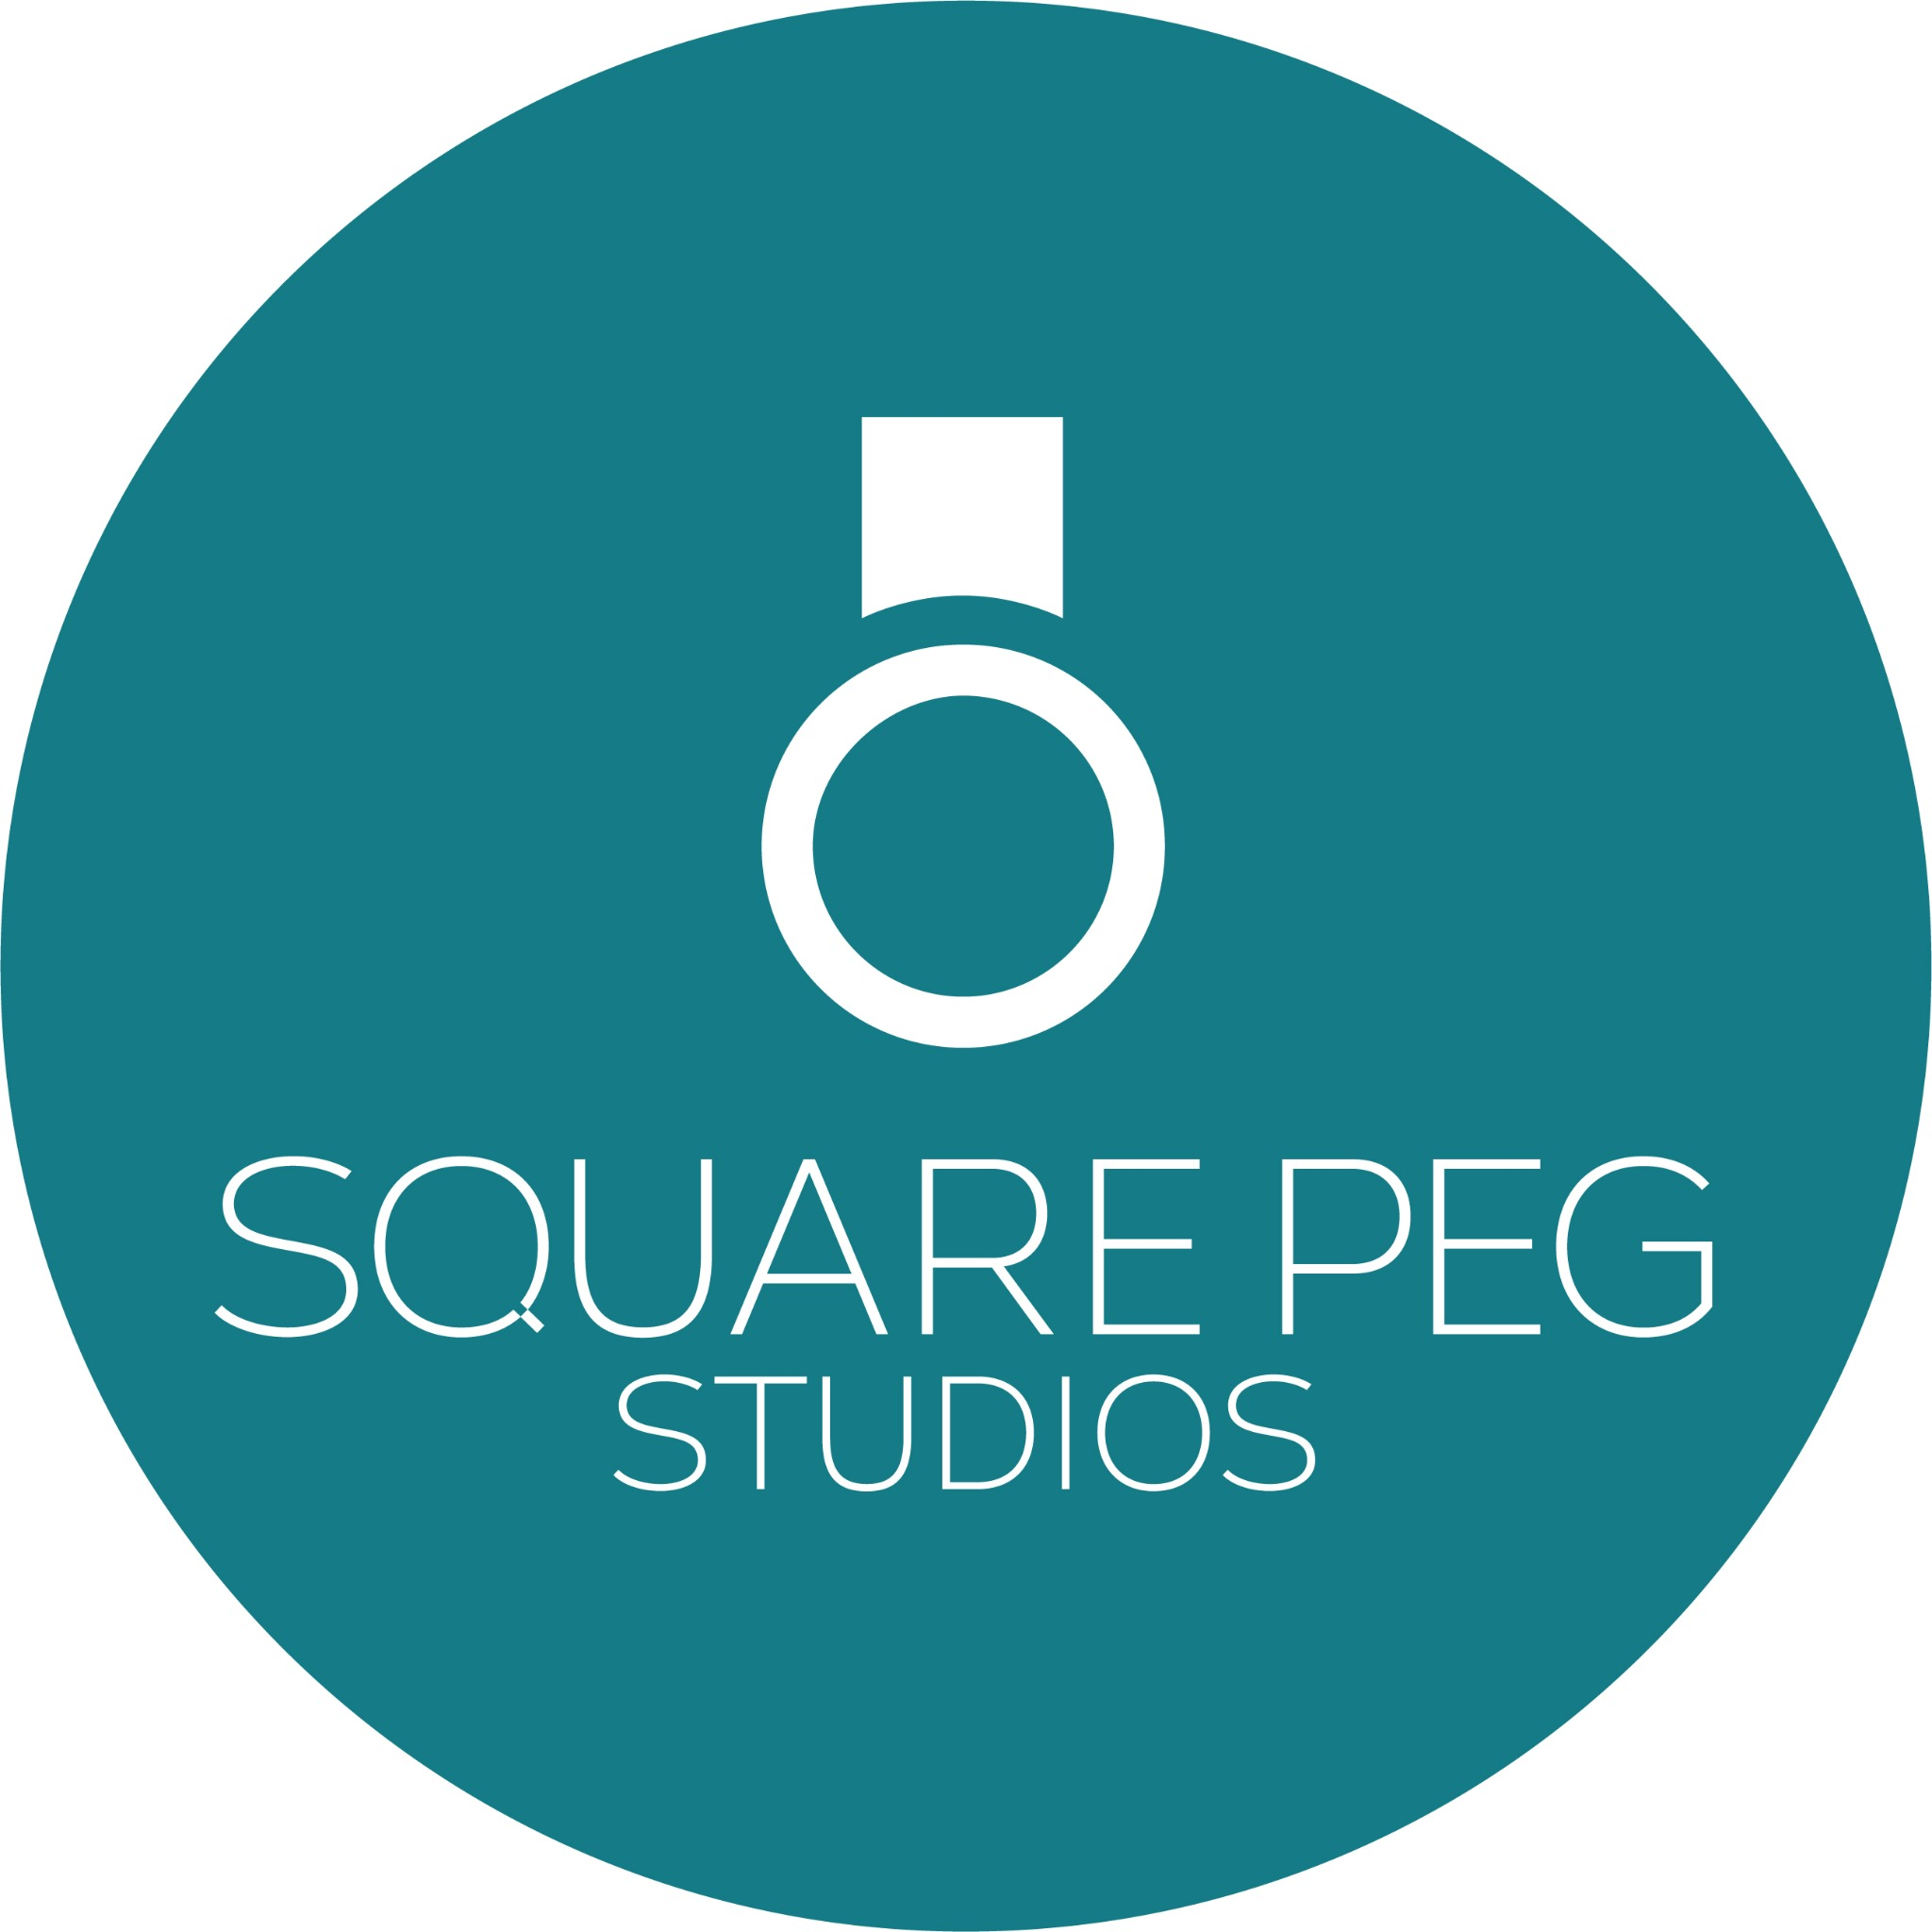 SquarePeg Studios